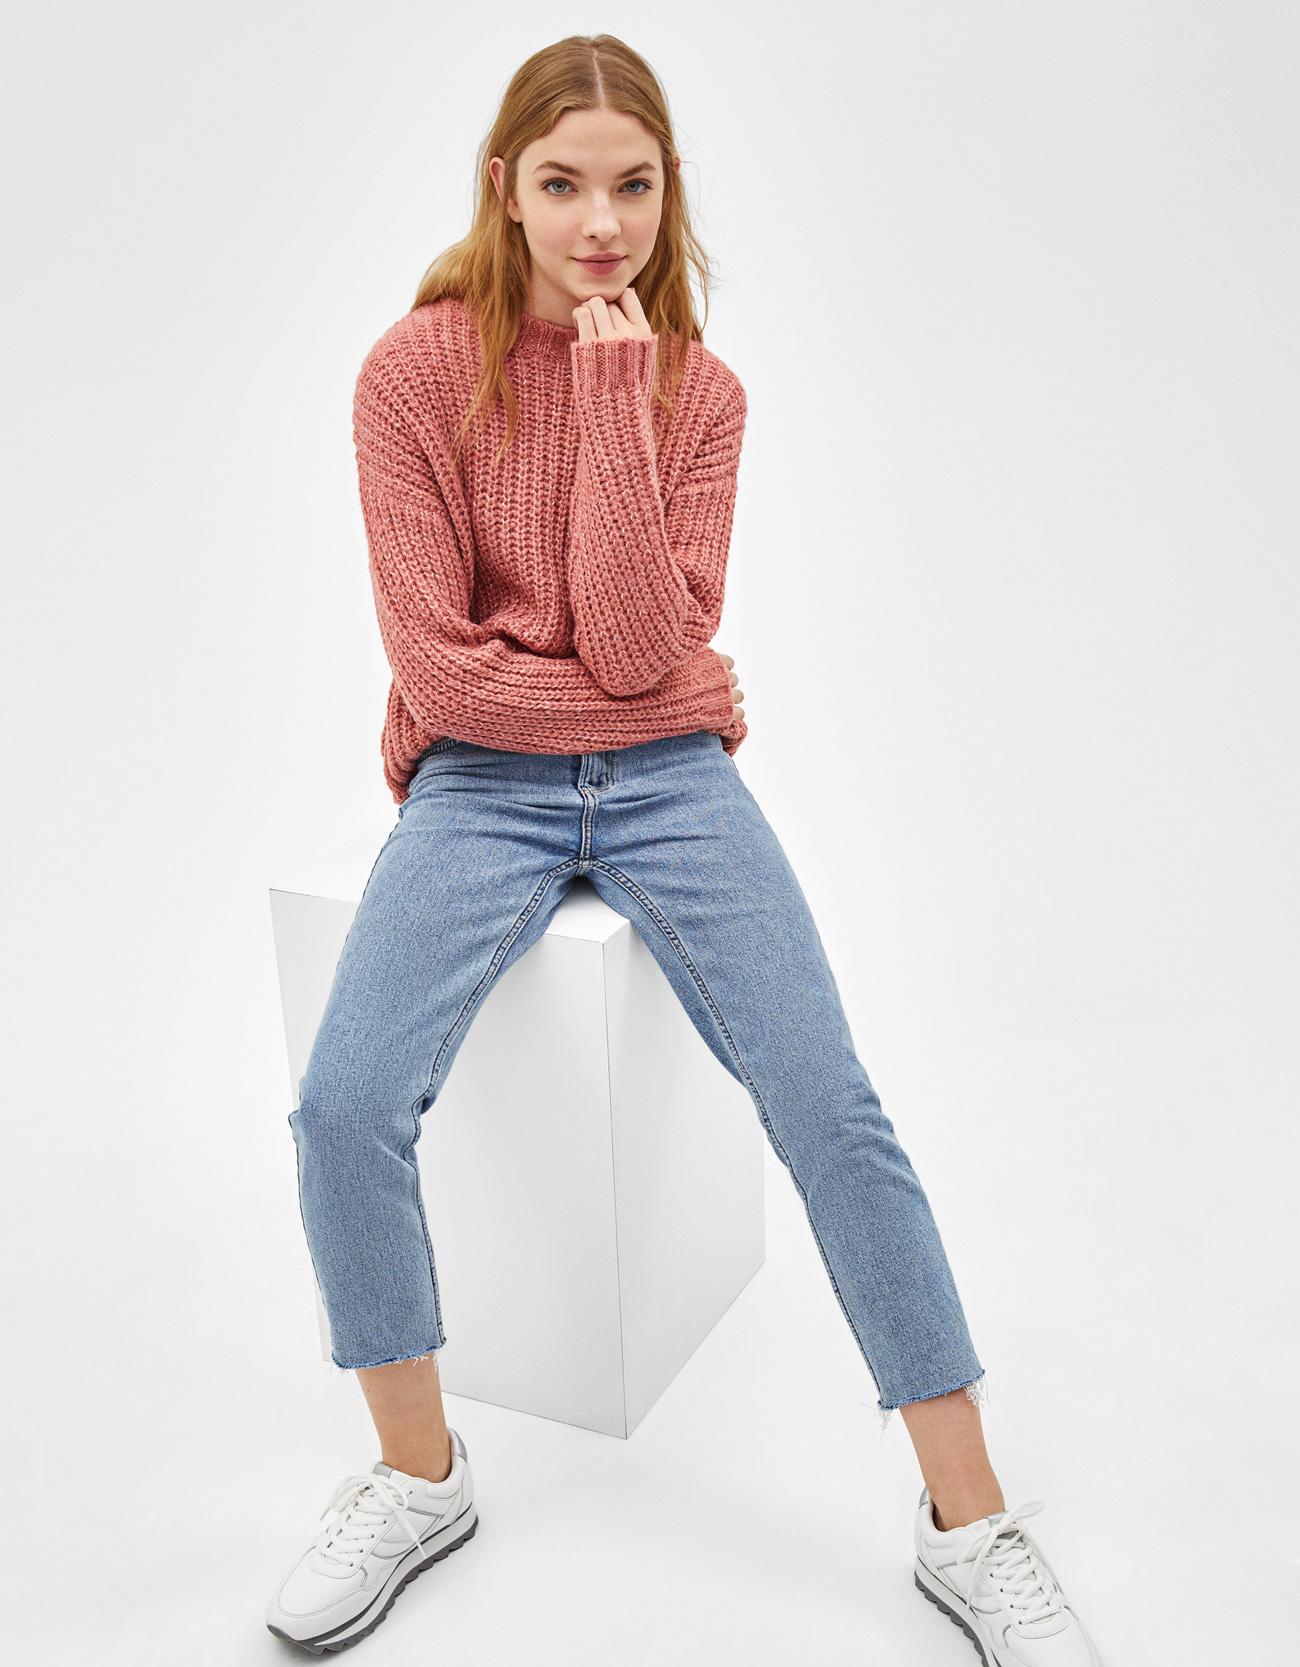 Sweater de malha com decote redondo - Blusas - Bershka Portugal 0b73f1207b9